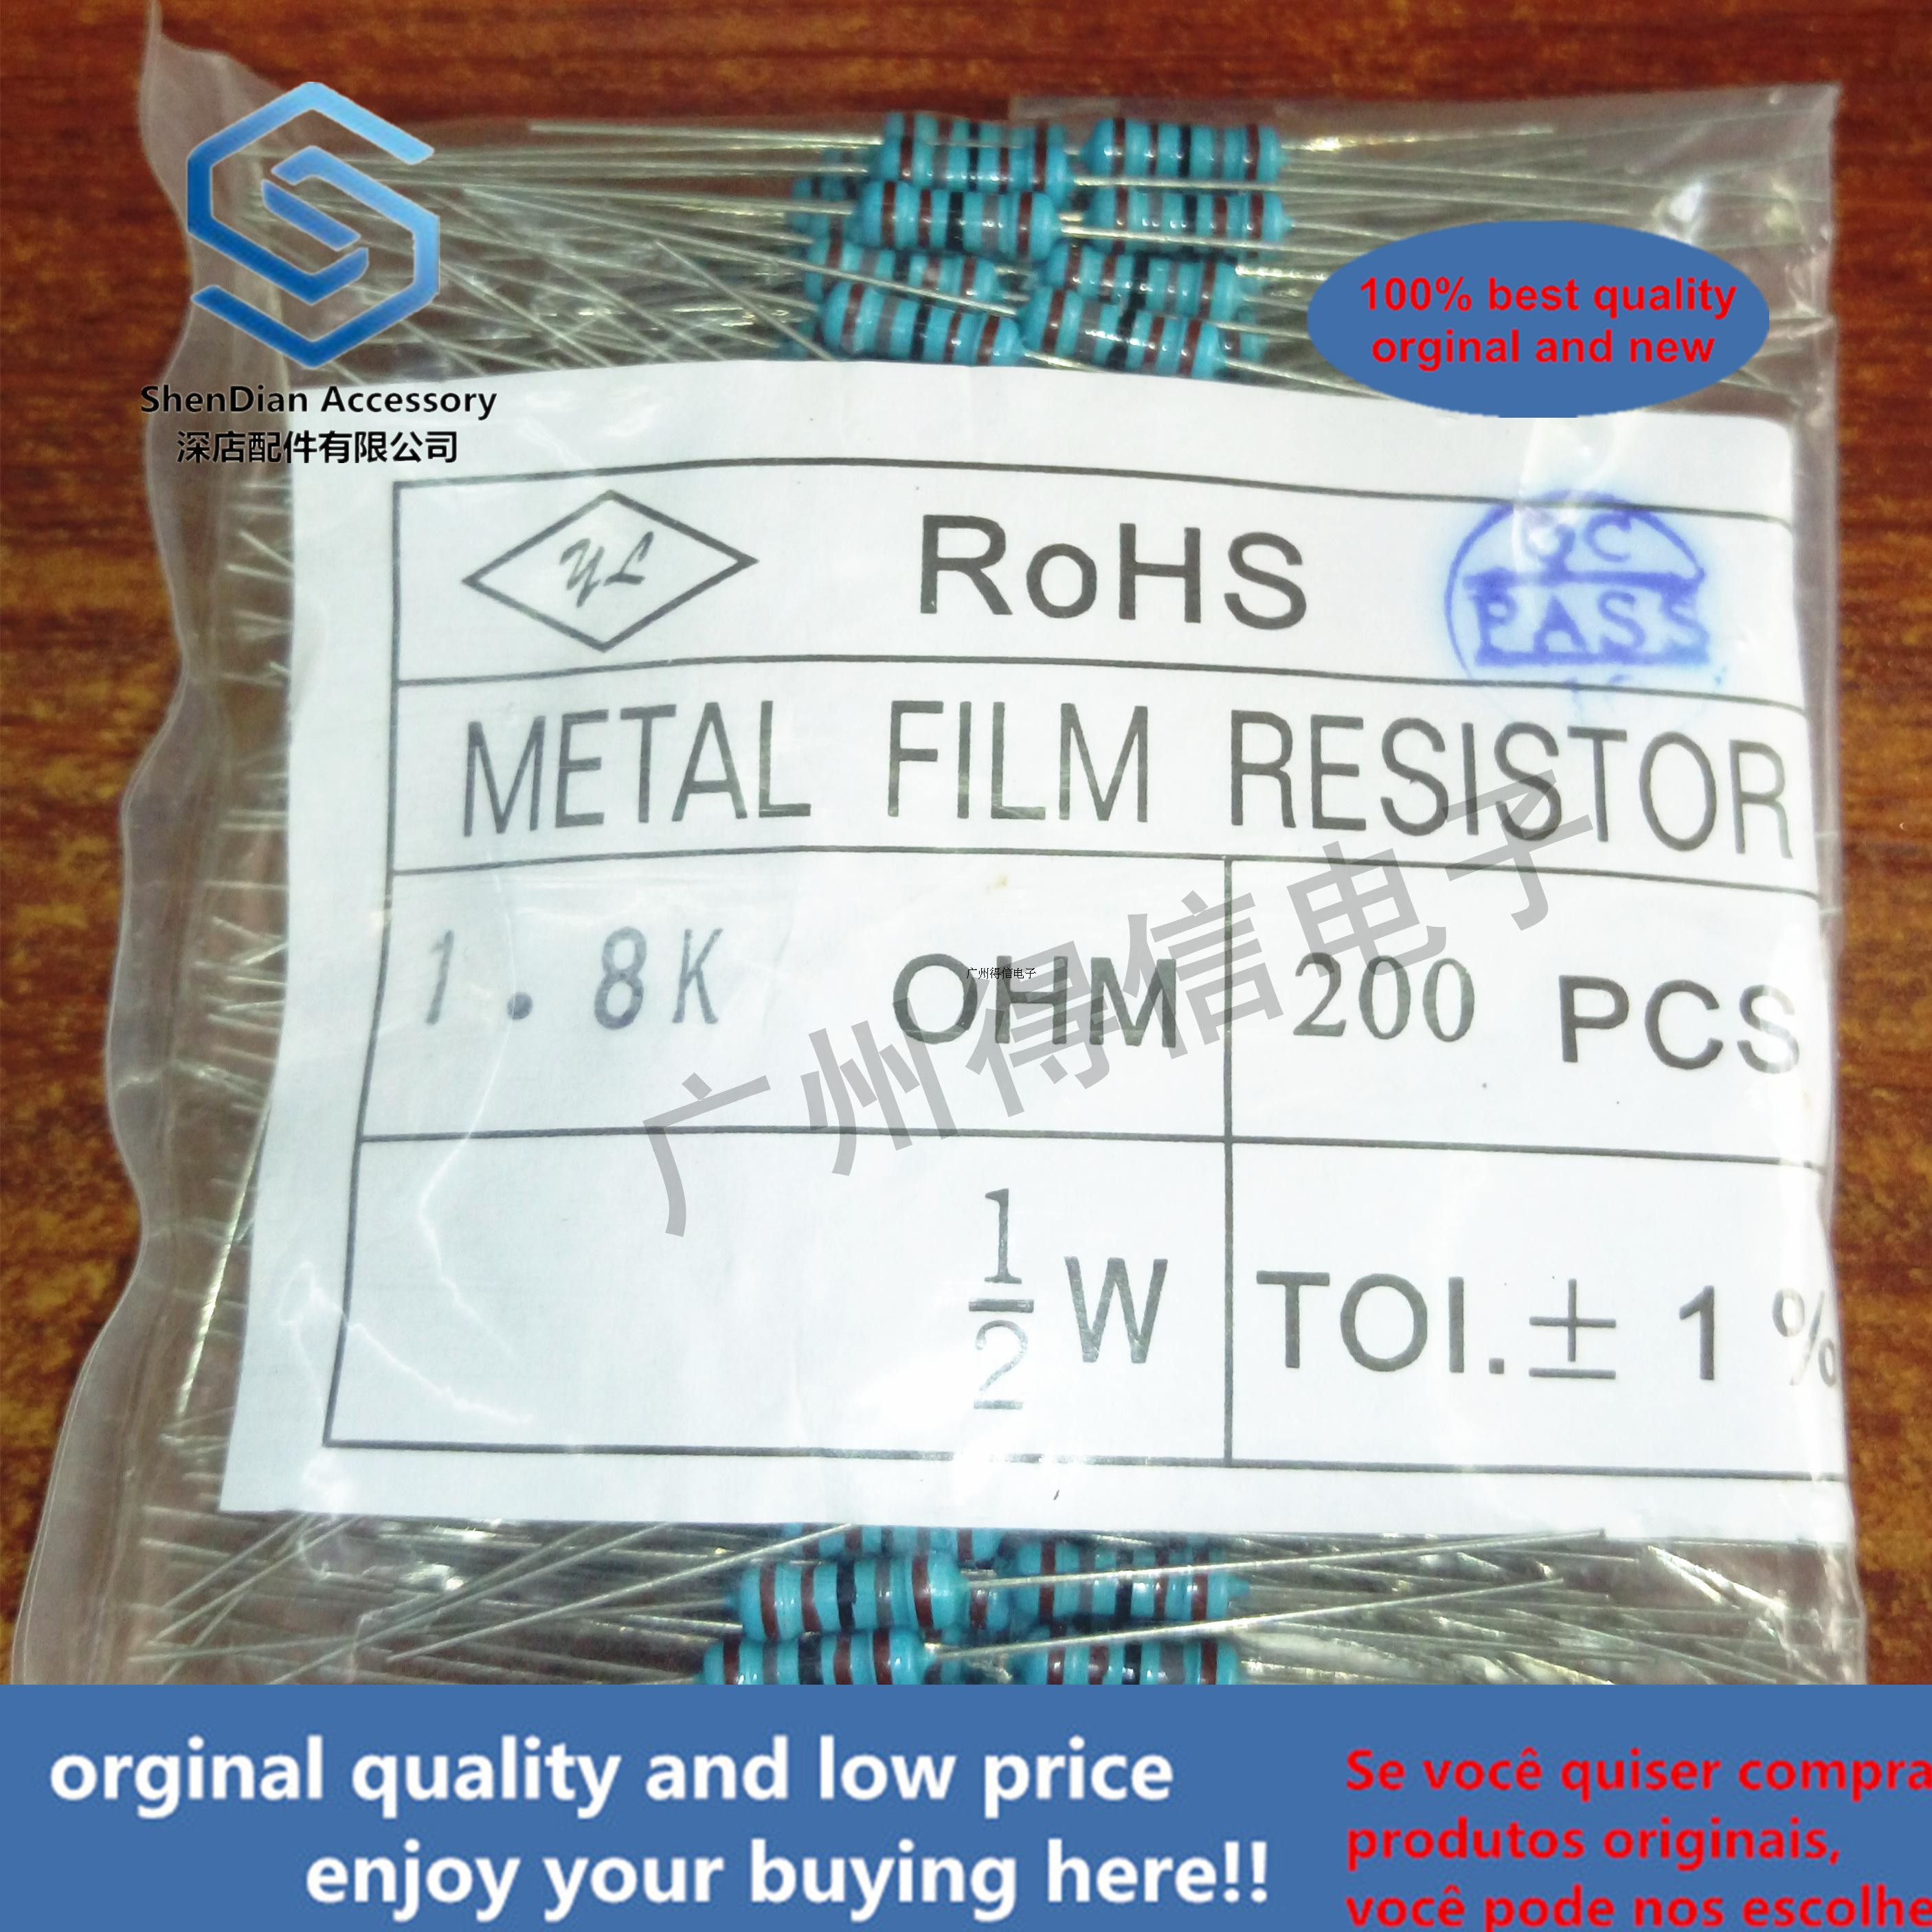 200pcs 1 / 2W 68K 1% Brand New Metal Film Iron Feet Resistance Bag 200 Pcs Per Pack